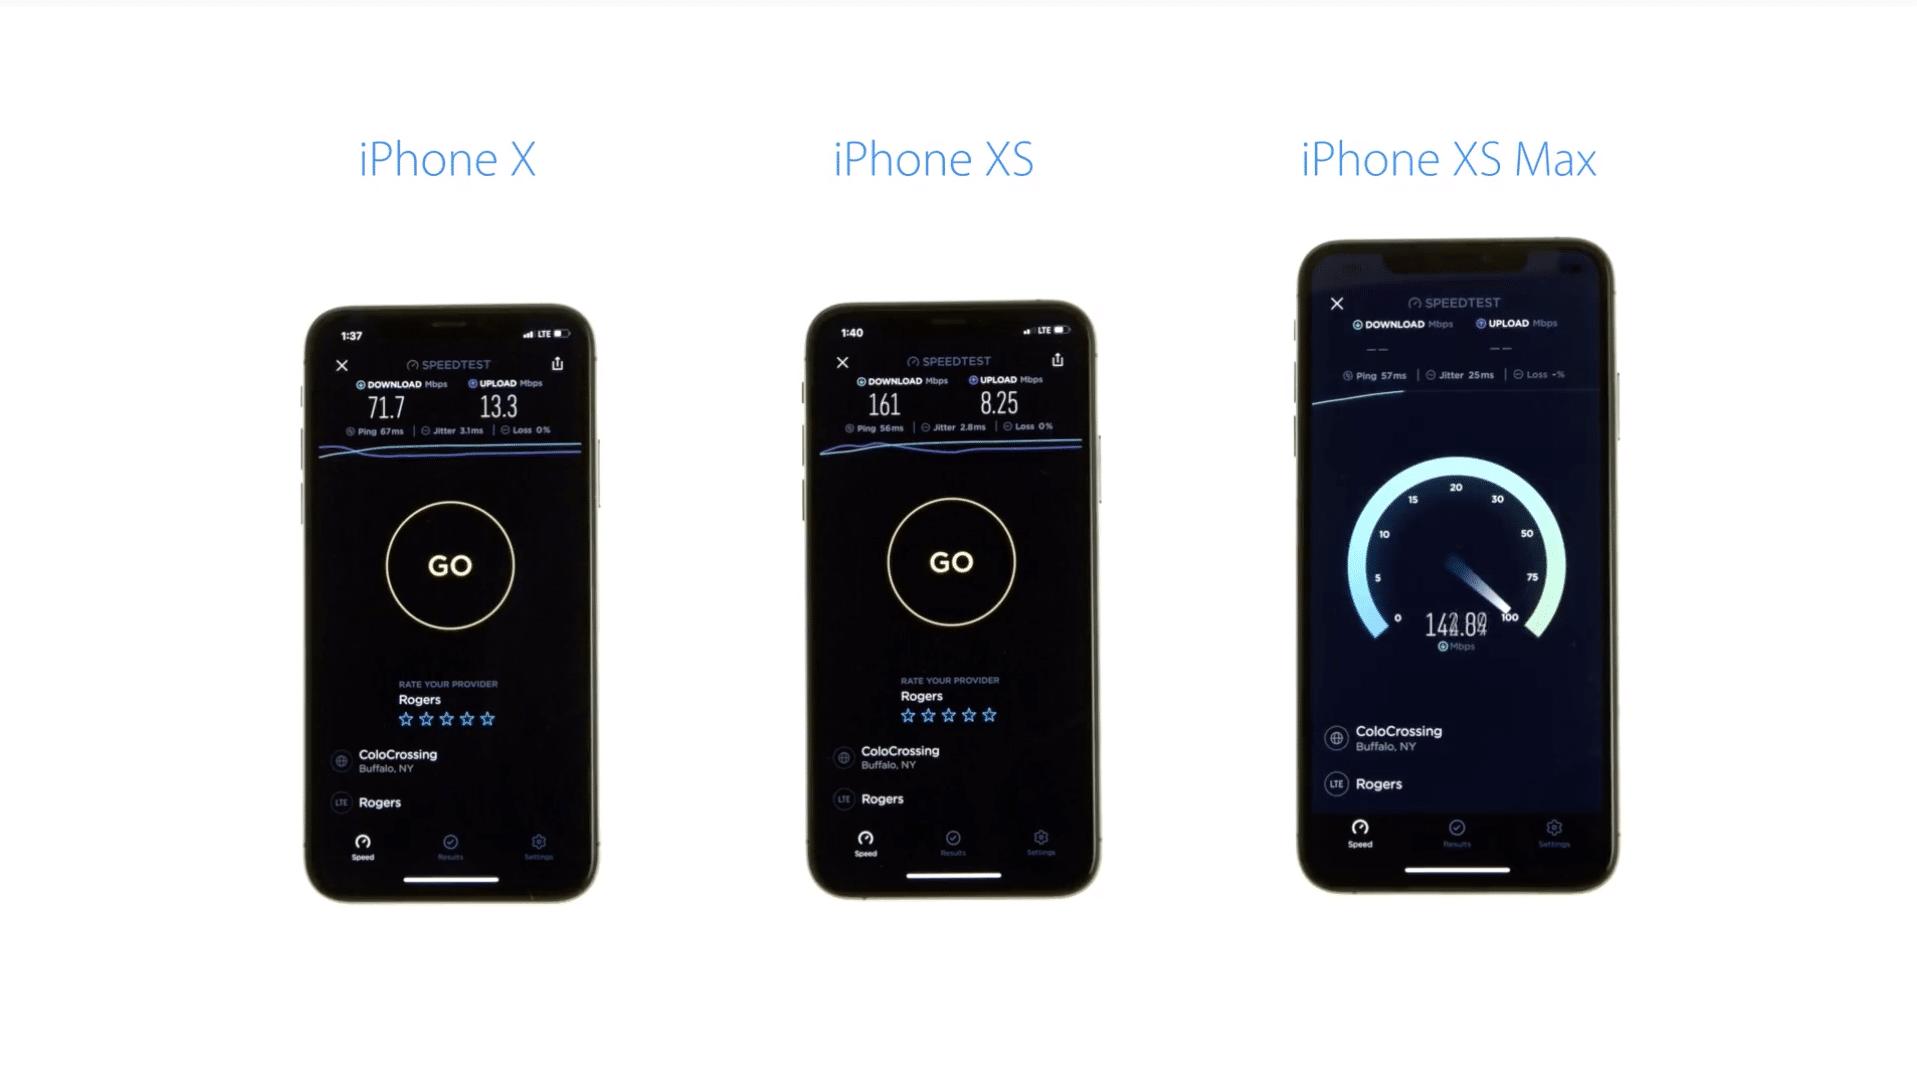 lte-speed-test-iphone-xs-max-vs-iphone-xs-vs-iphone-x-video